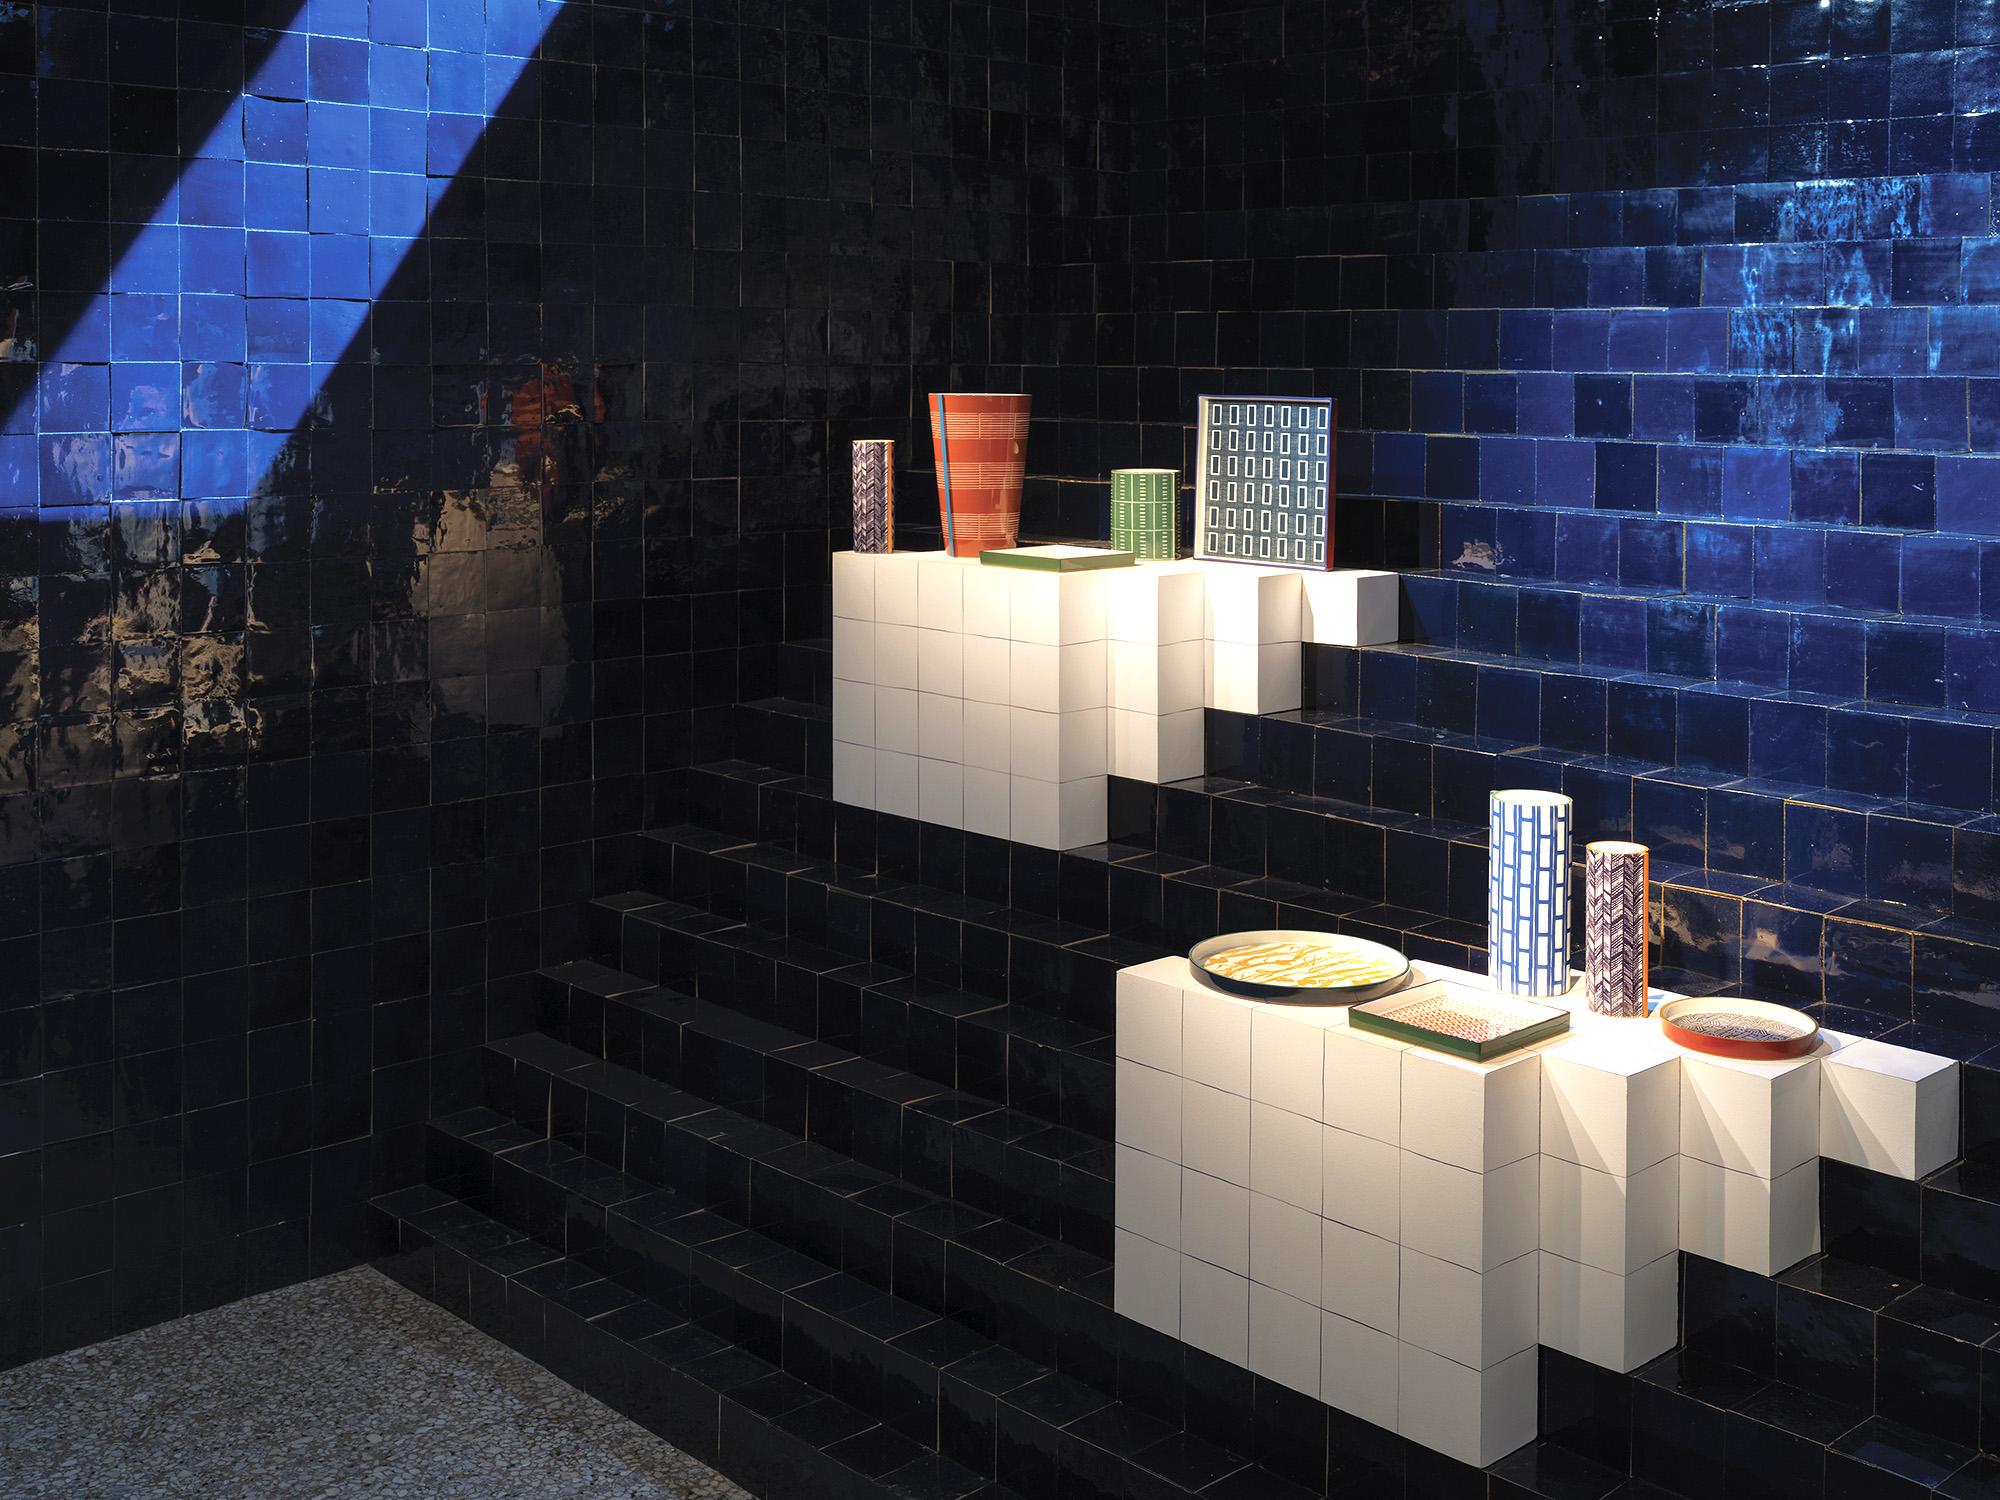 pavillon-hermes-2018-image3